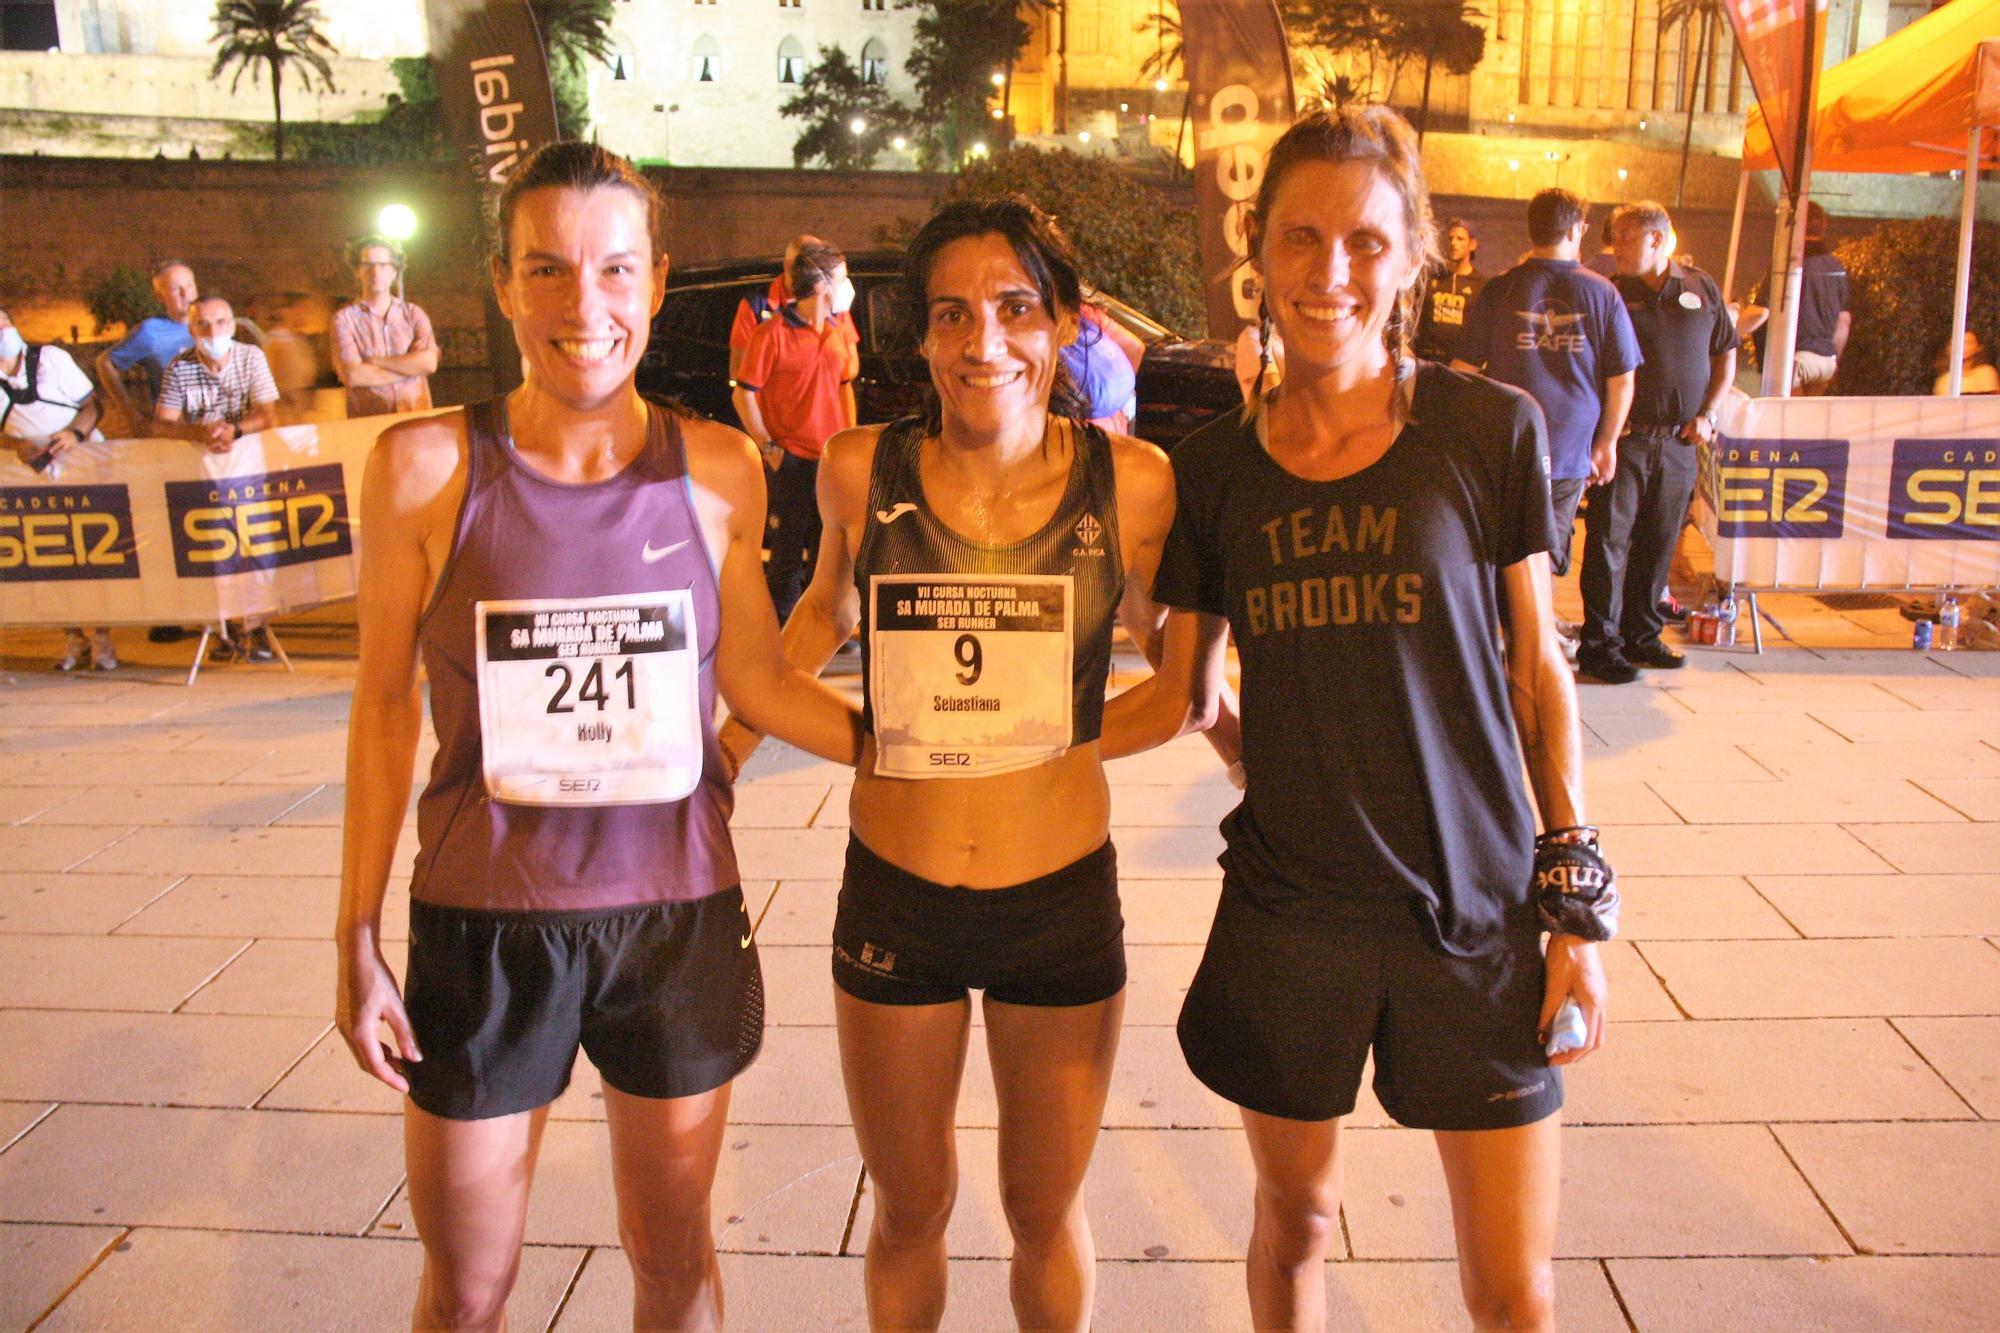 VII Cursa Nocturna Sa Murada-Ser Runner